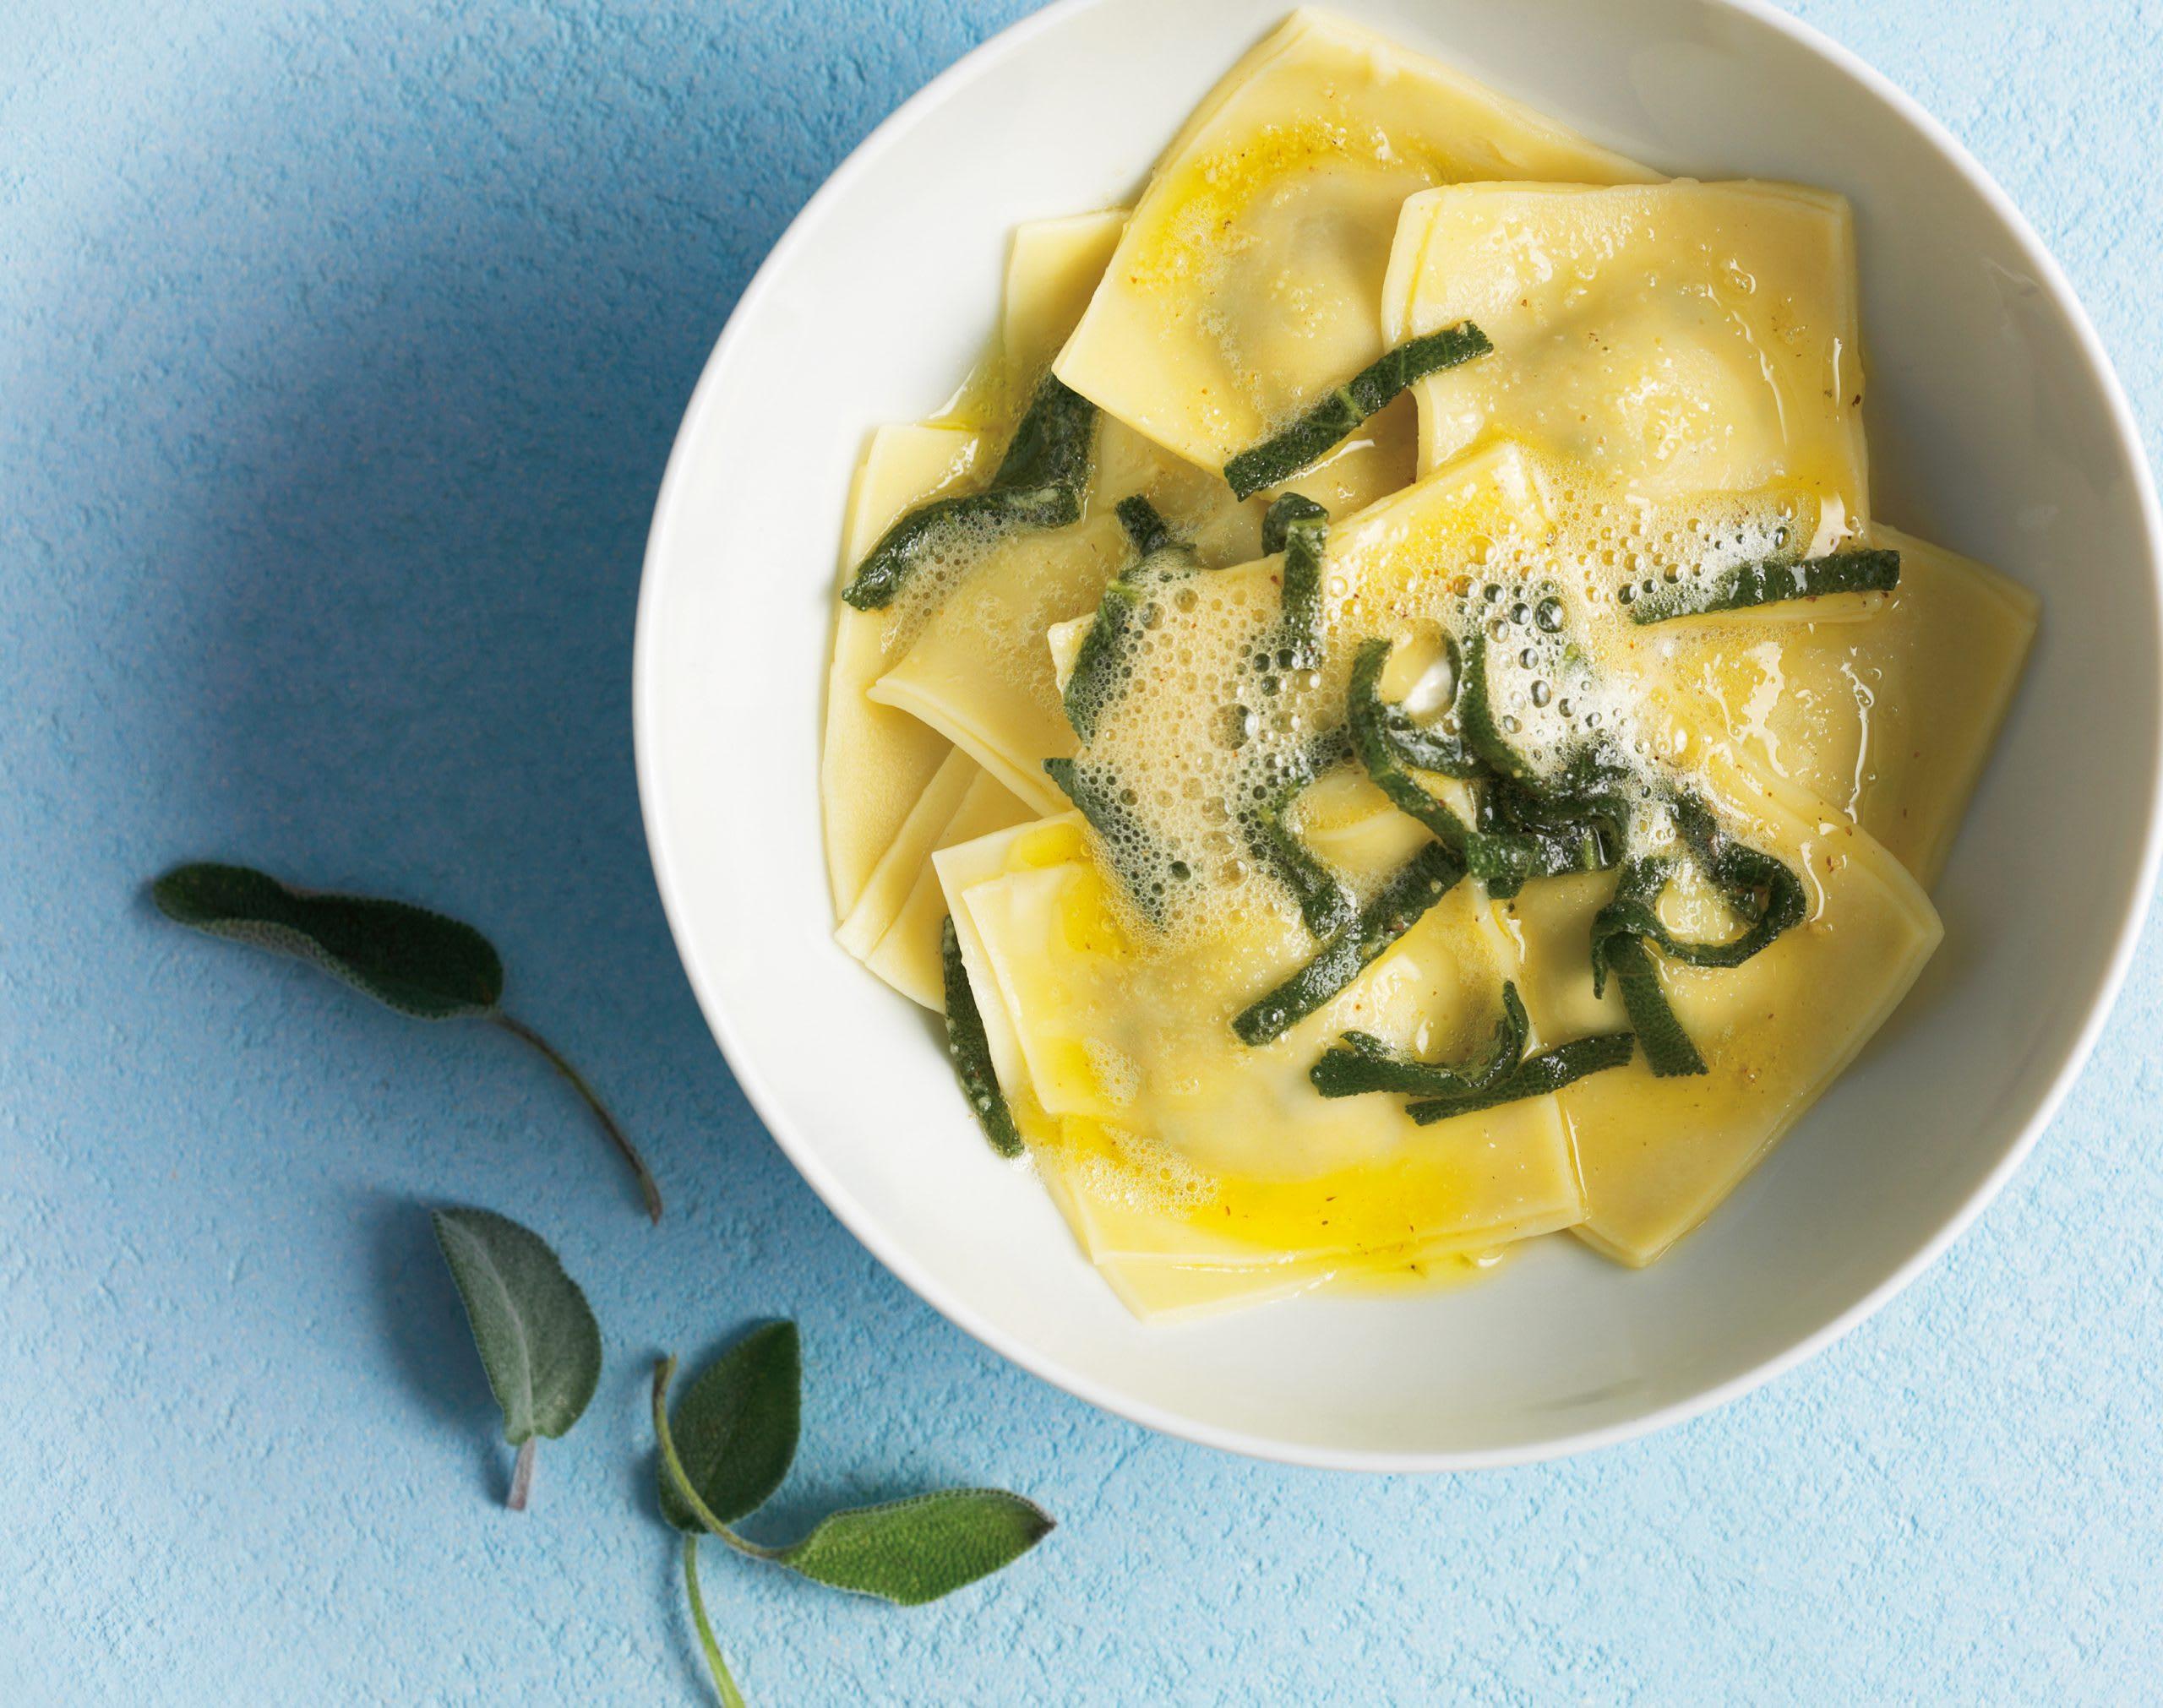 Ravioli au fromage frais